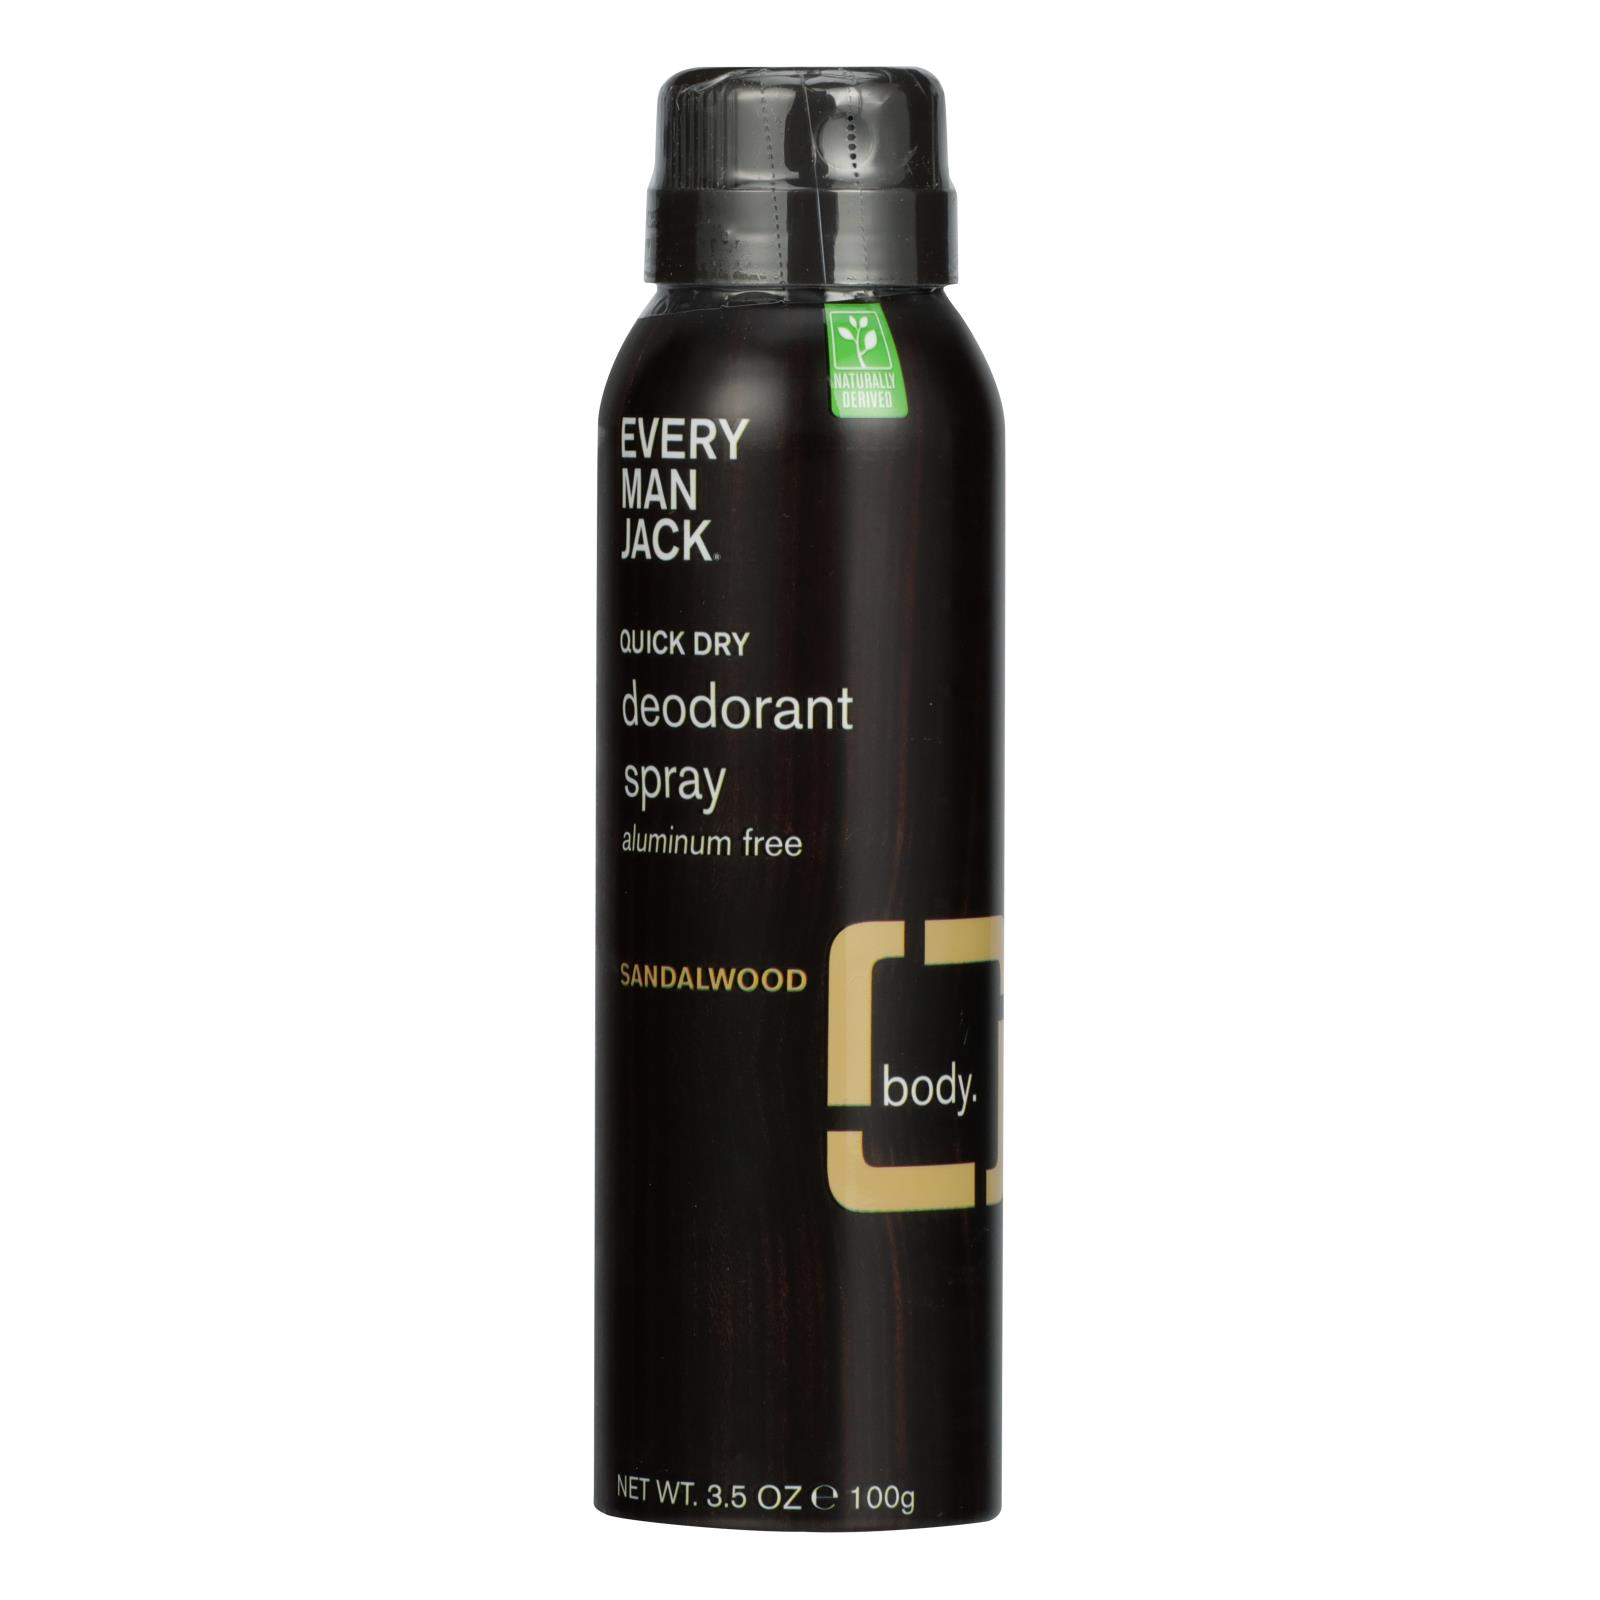 Every Man Jack - Deodorant Qk Dry Sandlwd Spray - 1 Each - 3.5 OZ